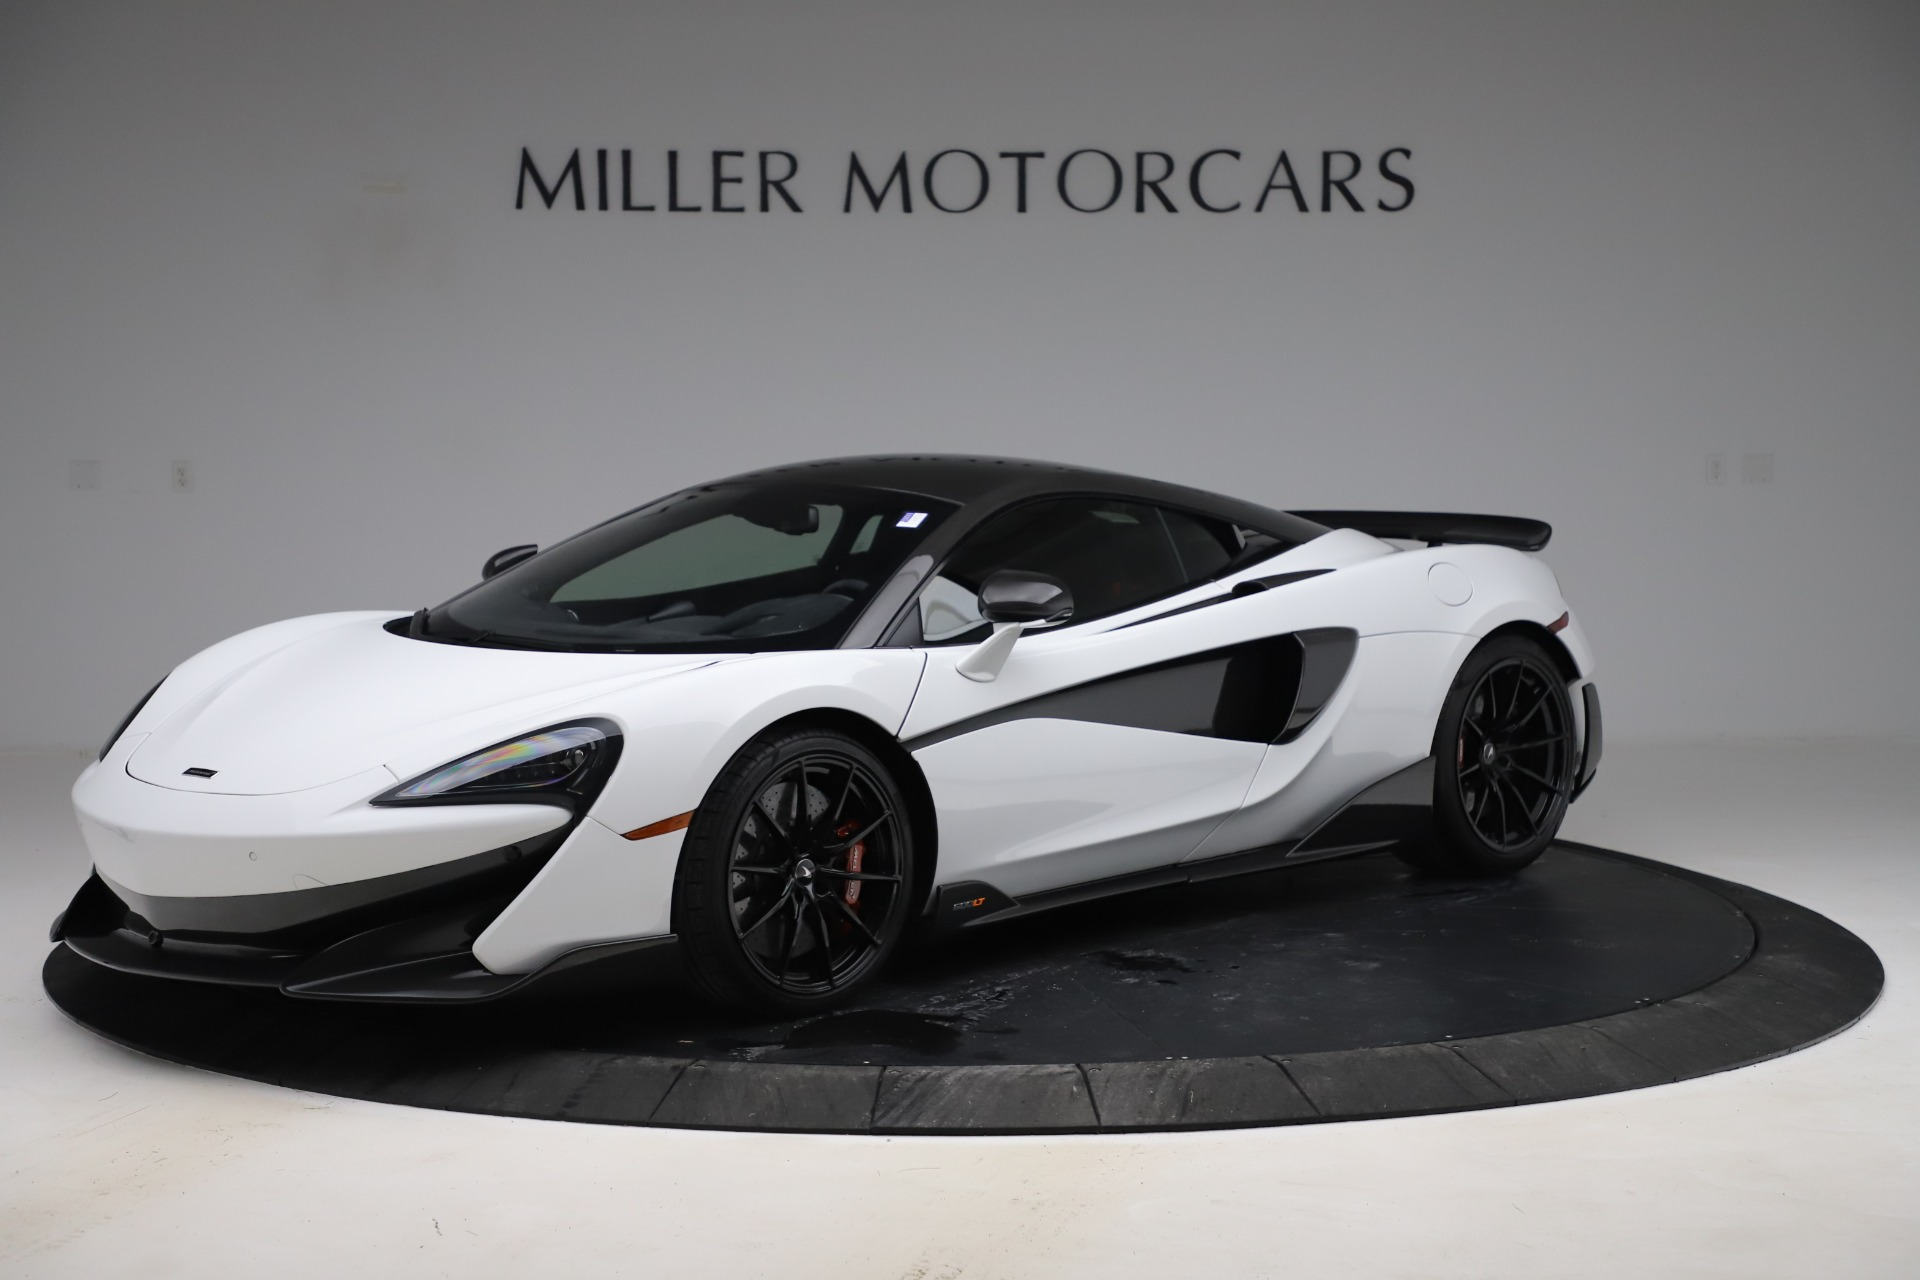 Used 2019 McLaren 600LT Coupe for sale $219,900 at Maserati of Westport in Westport CT 06880 1